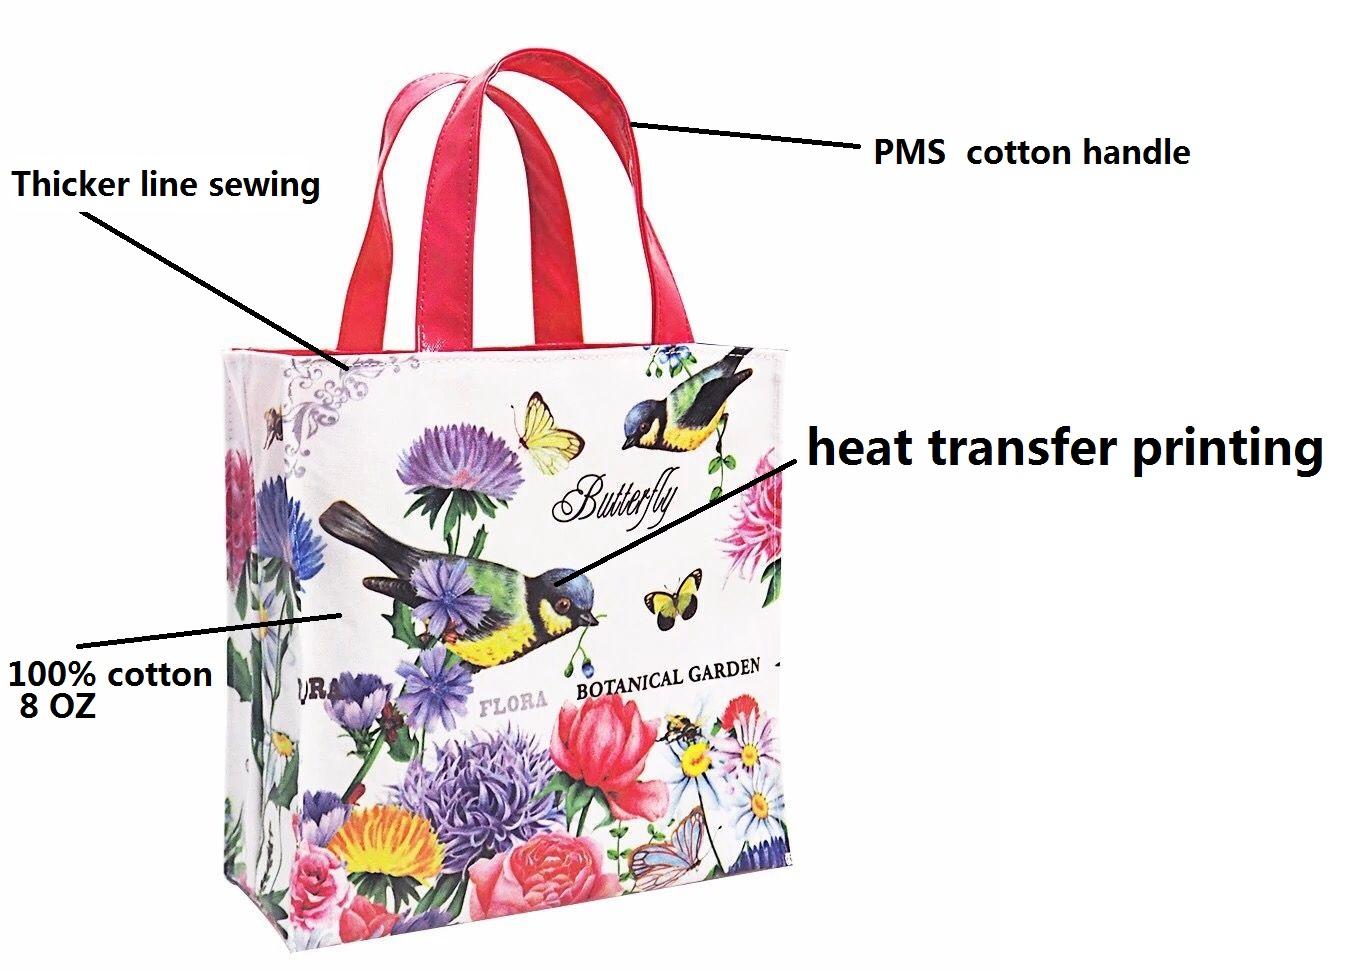 Oem โลโก้ที่กำหนดเองพิมพ์ผ้าฝ้ายมินิผ้า/ผ้า/ผ้า/ผ้า/ผ้า/ผ้า/ผ้า/ผ้า/ผ้า/ผ้า/ถุงช้อปปิ้ง gusset กระเป๋าด้านนอก